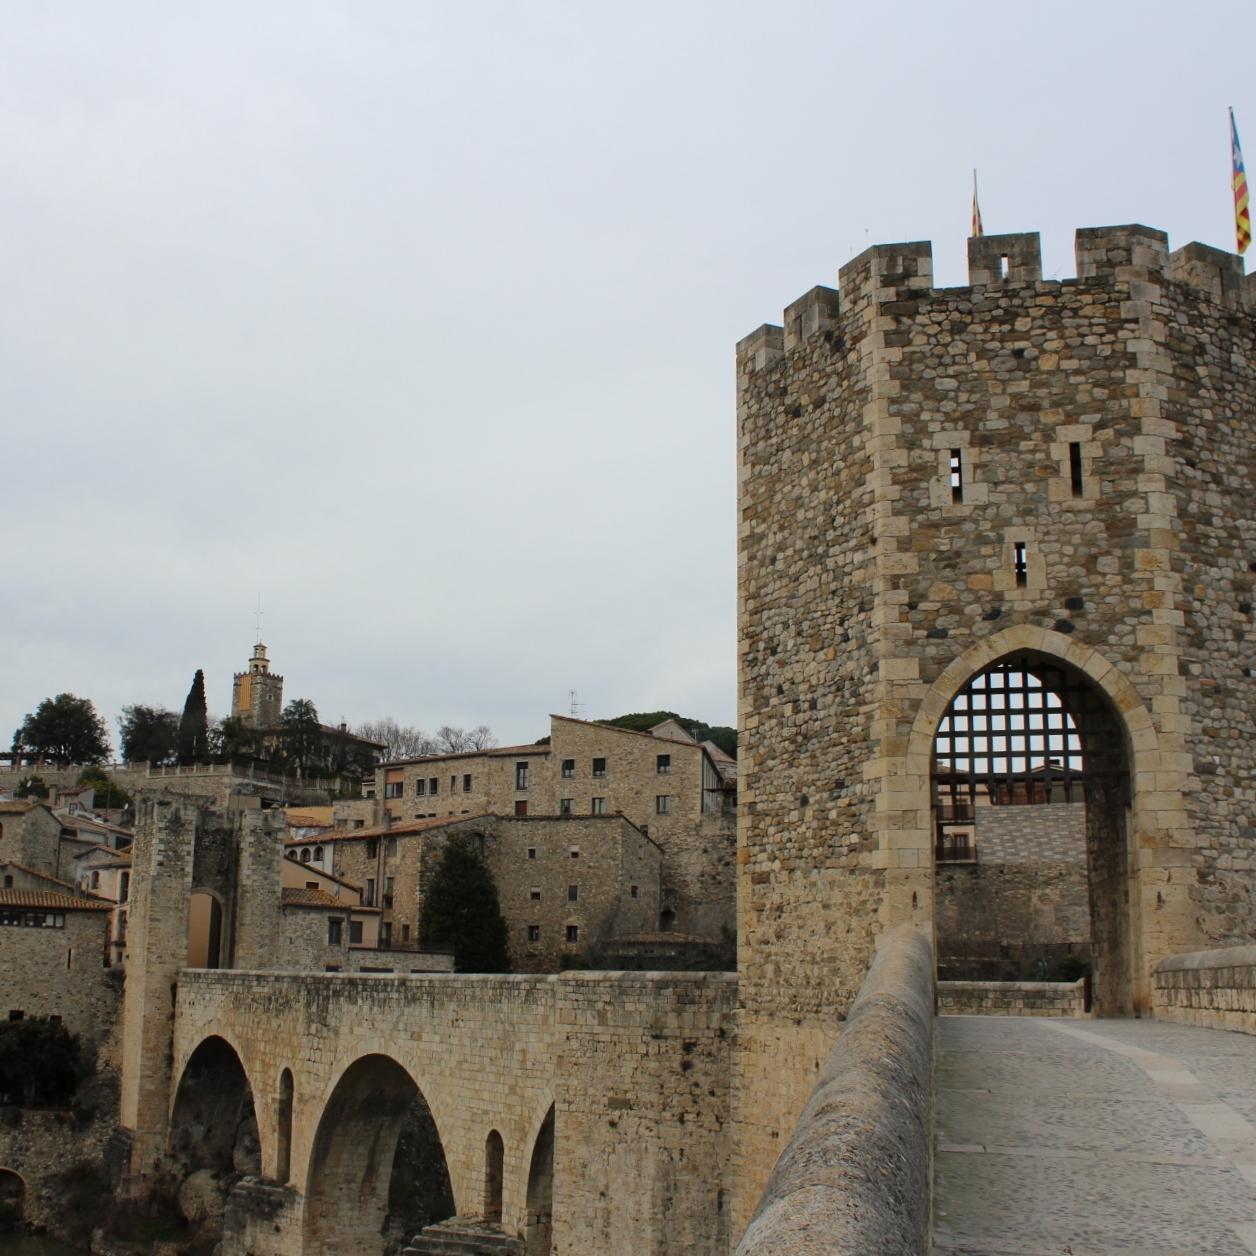 Girona / Besalu